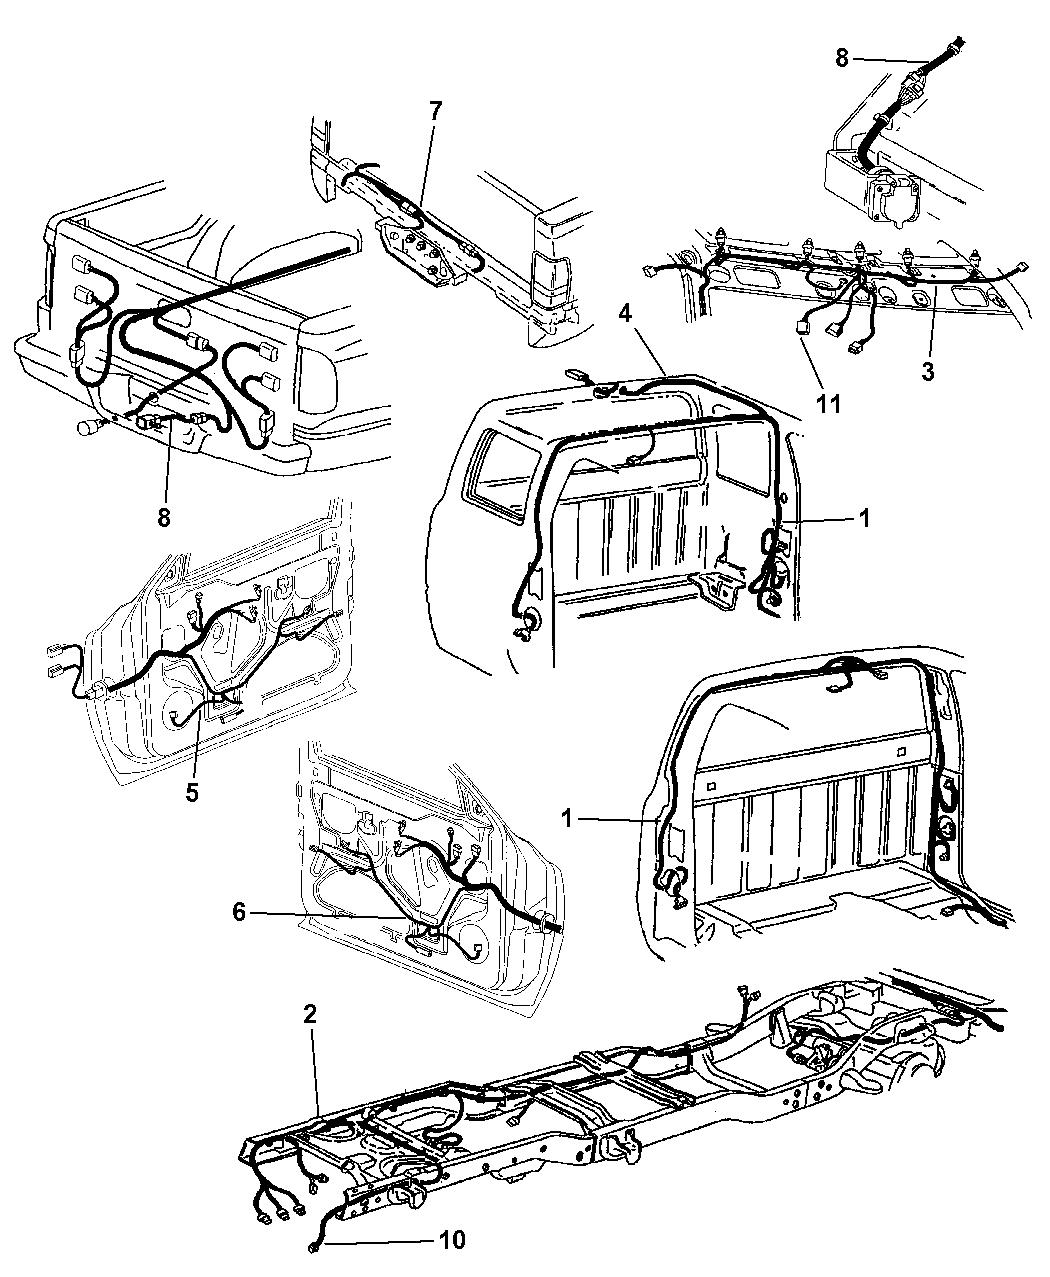 1999 Dodge Ram 2500 Regular Cab Wiring - Body & Accessories